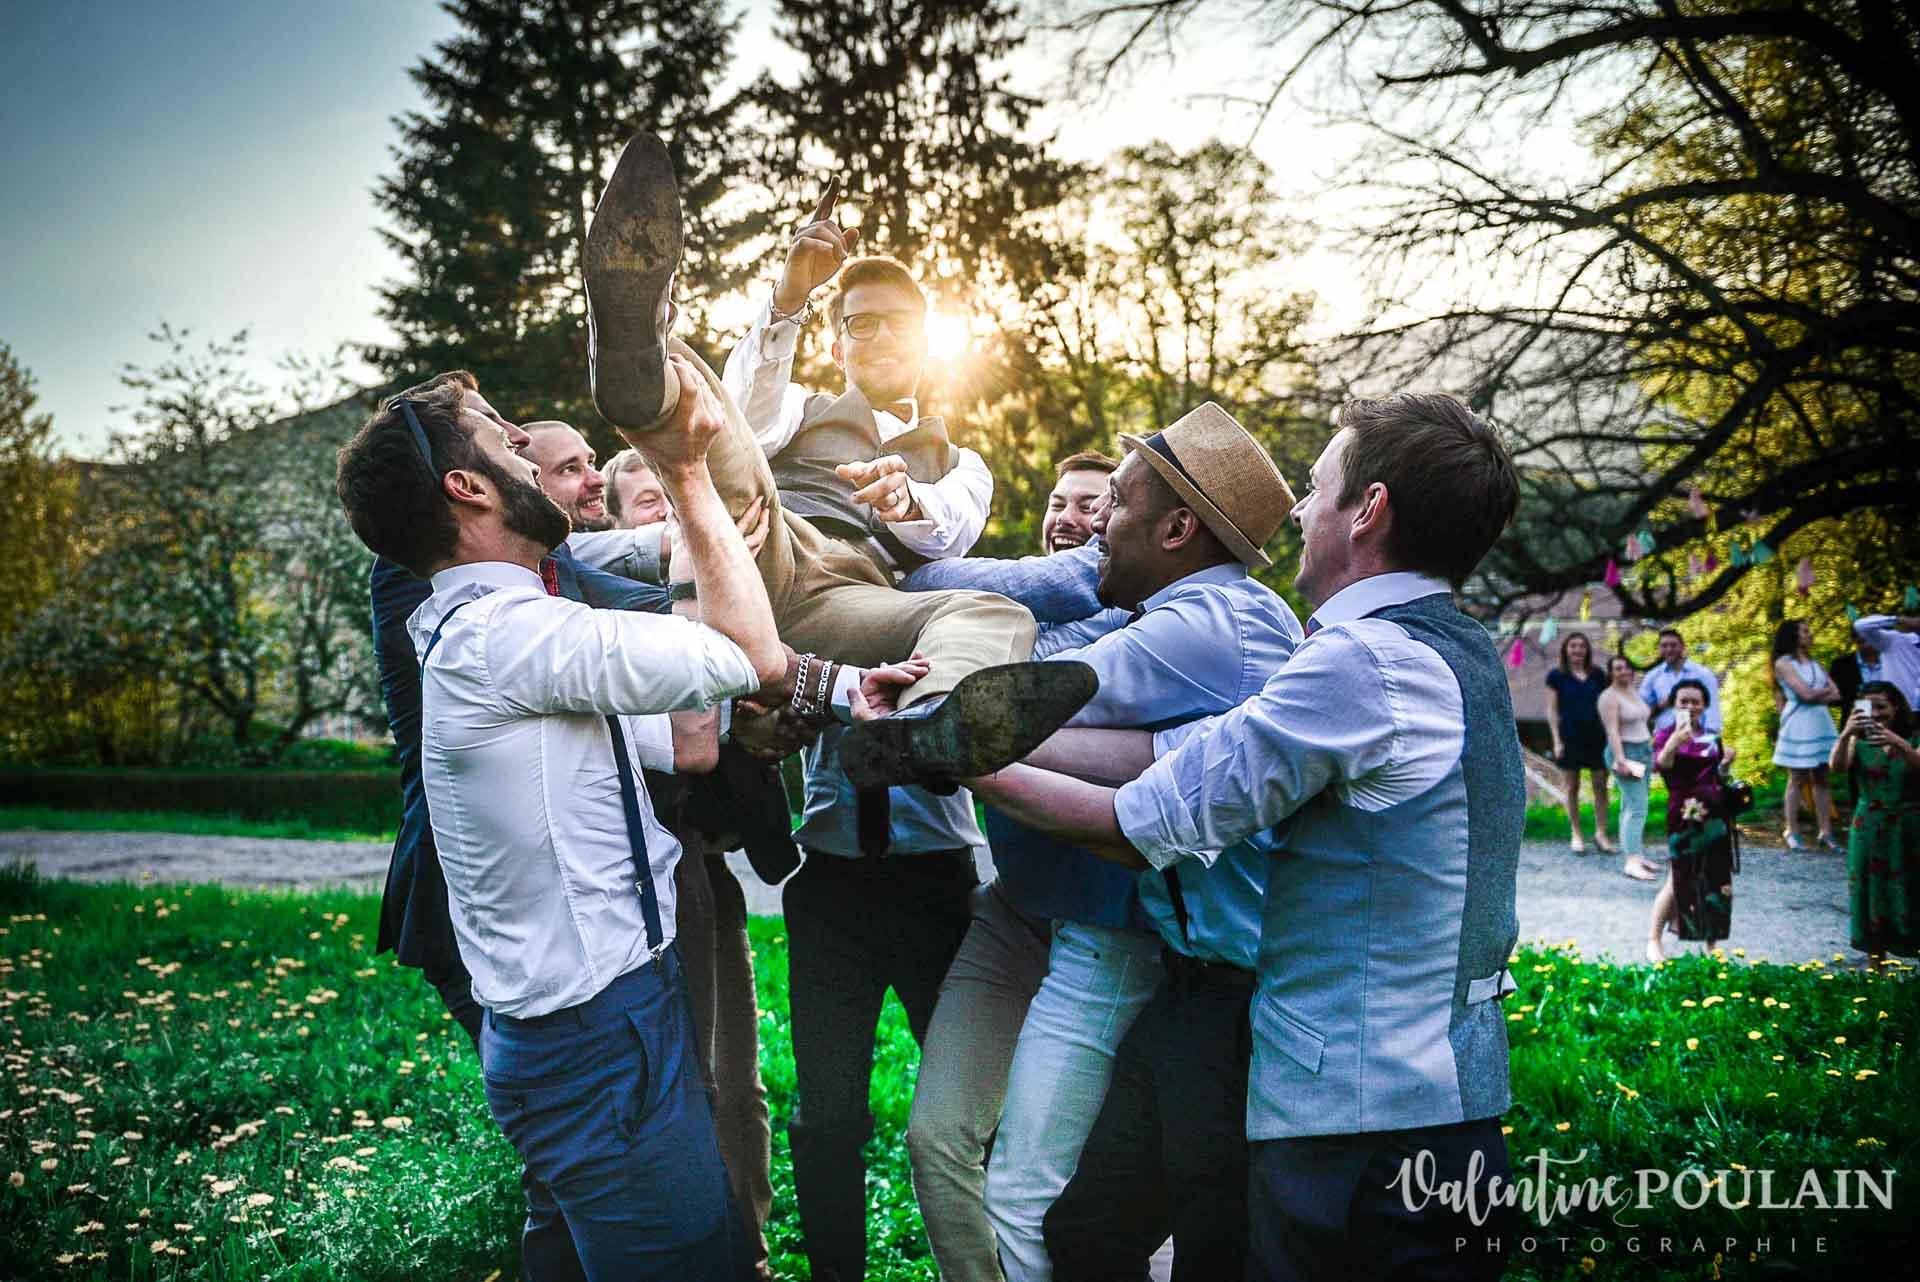 Mariage hippie funky - Valentine Poulain friends